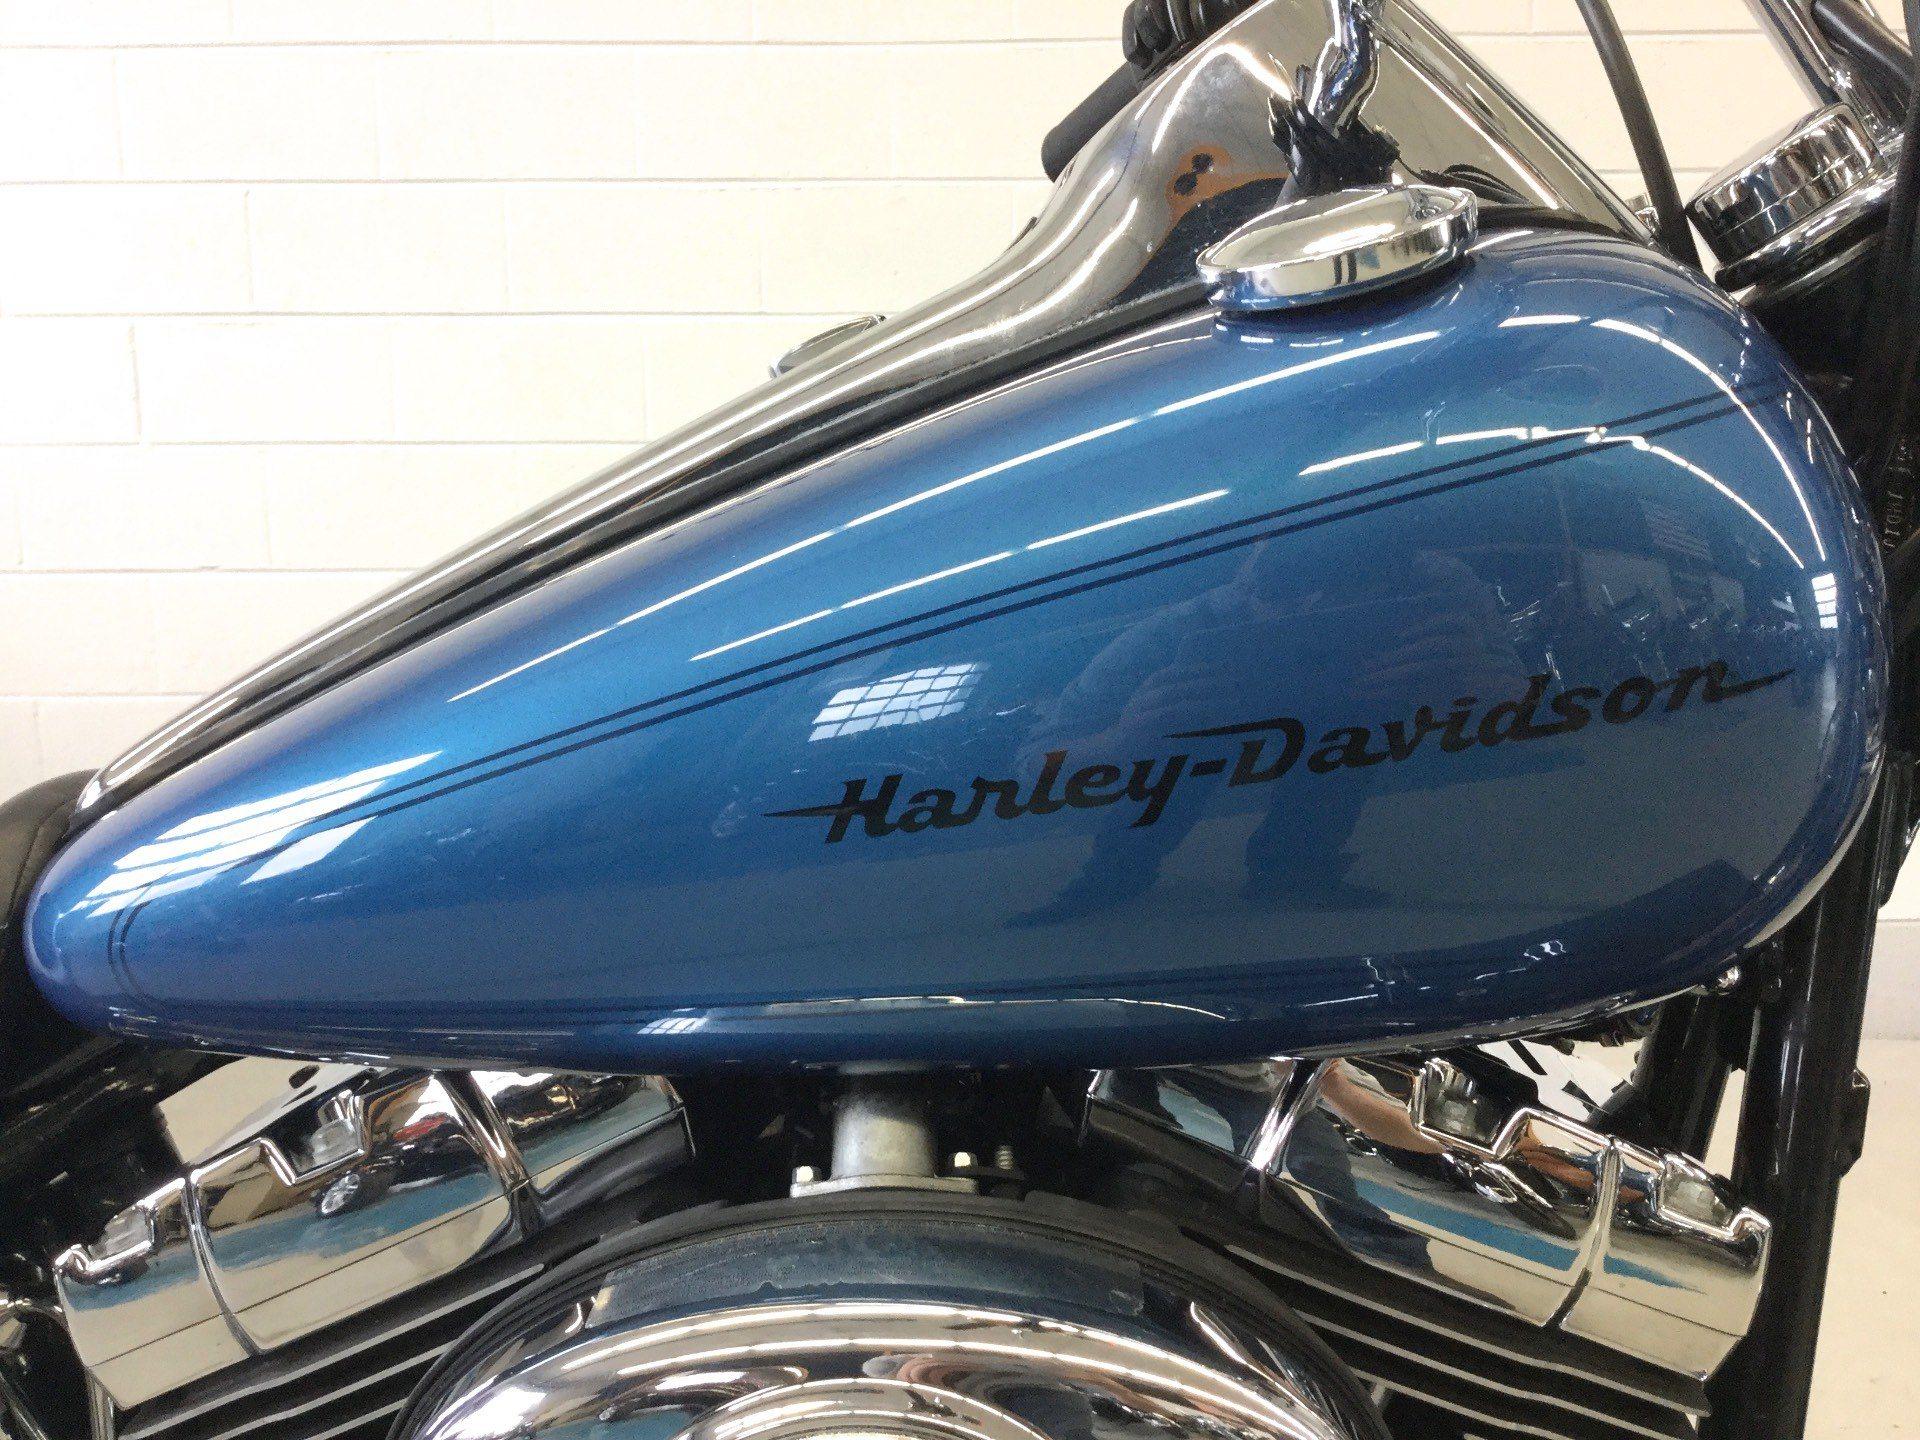 Model Details Classic Iron Fredericksburg 5876 Harley Davidson Timing Belt 2005 Fxstd Fxstdi Softail Deuce In Virginia